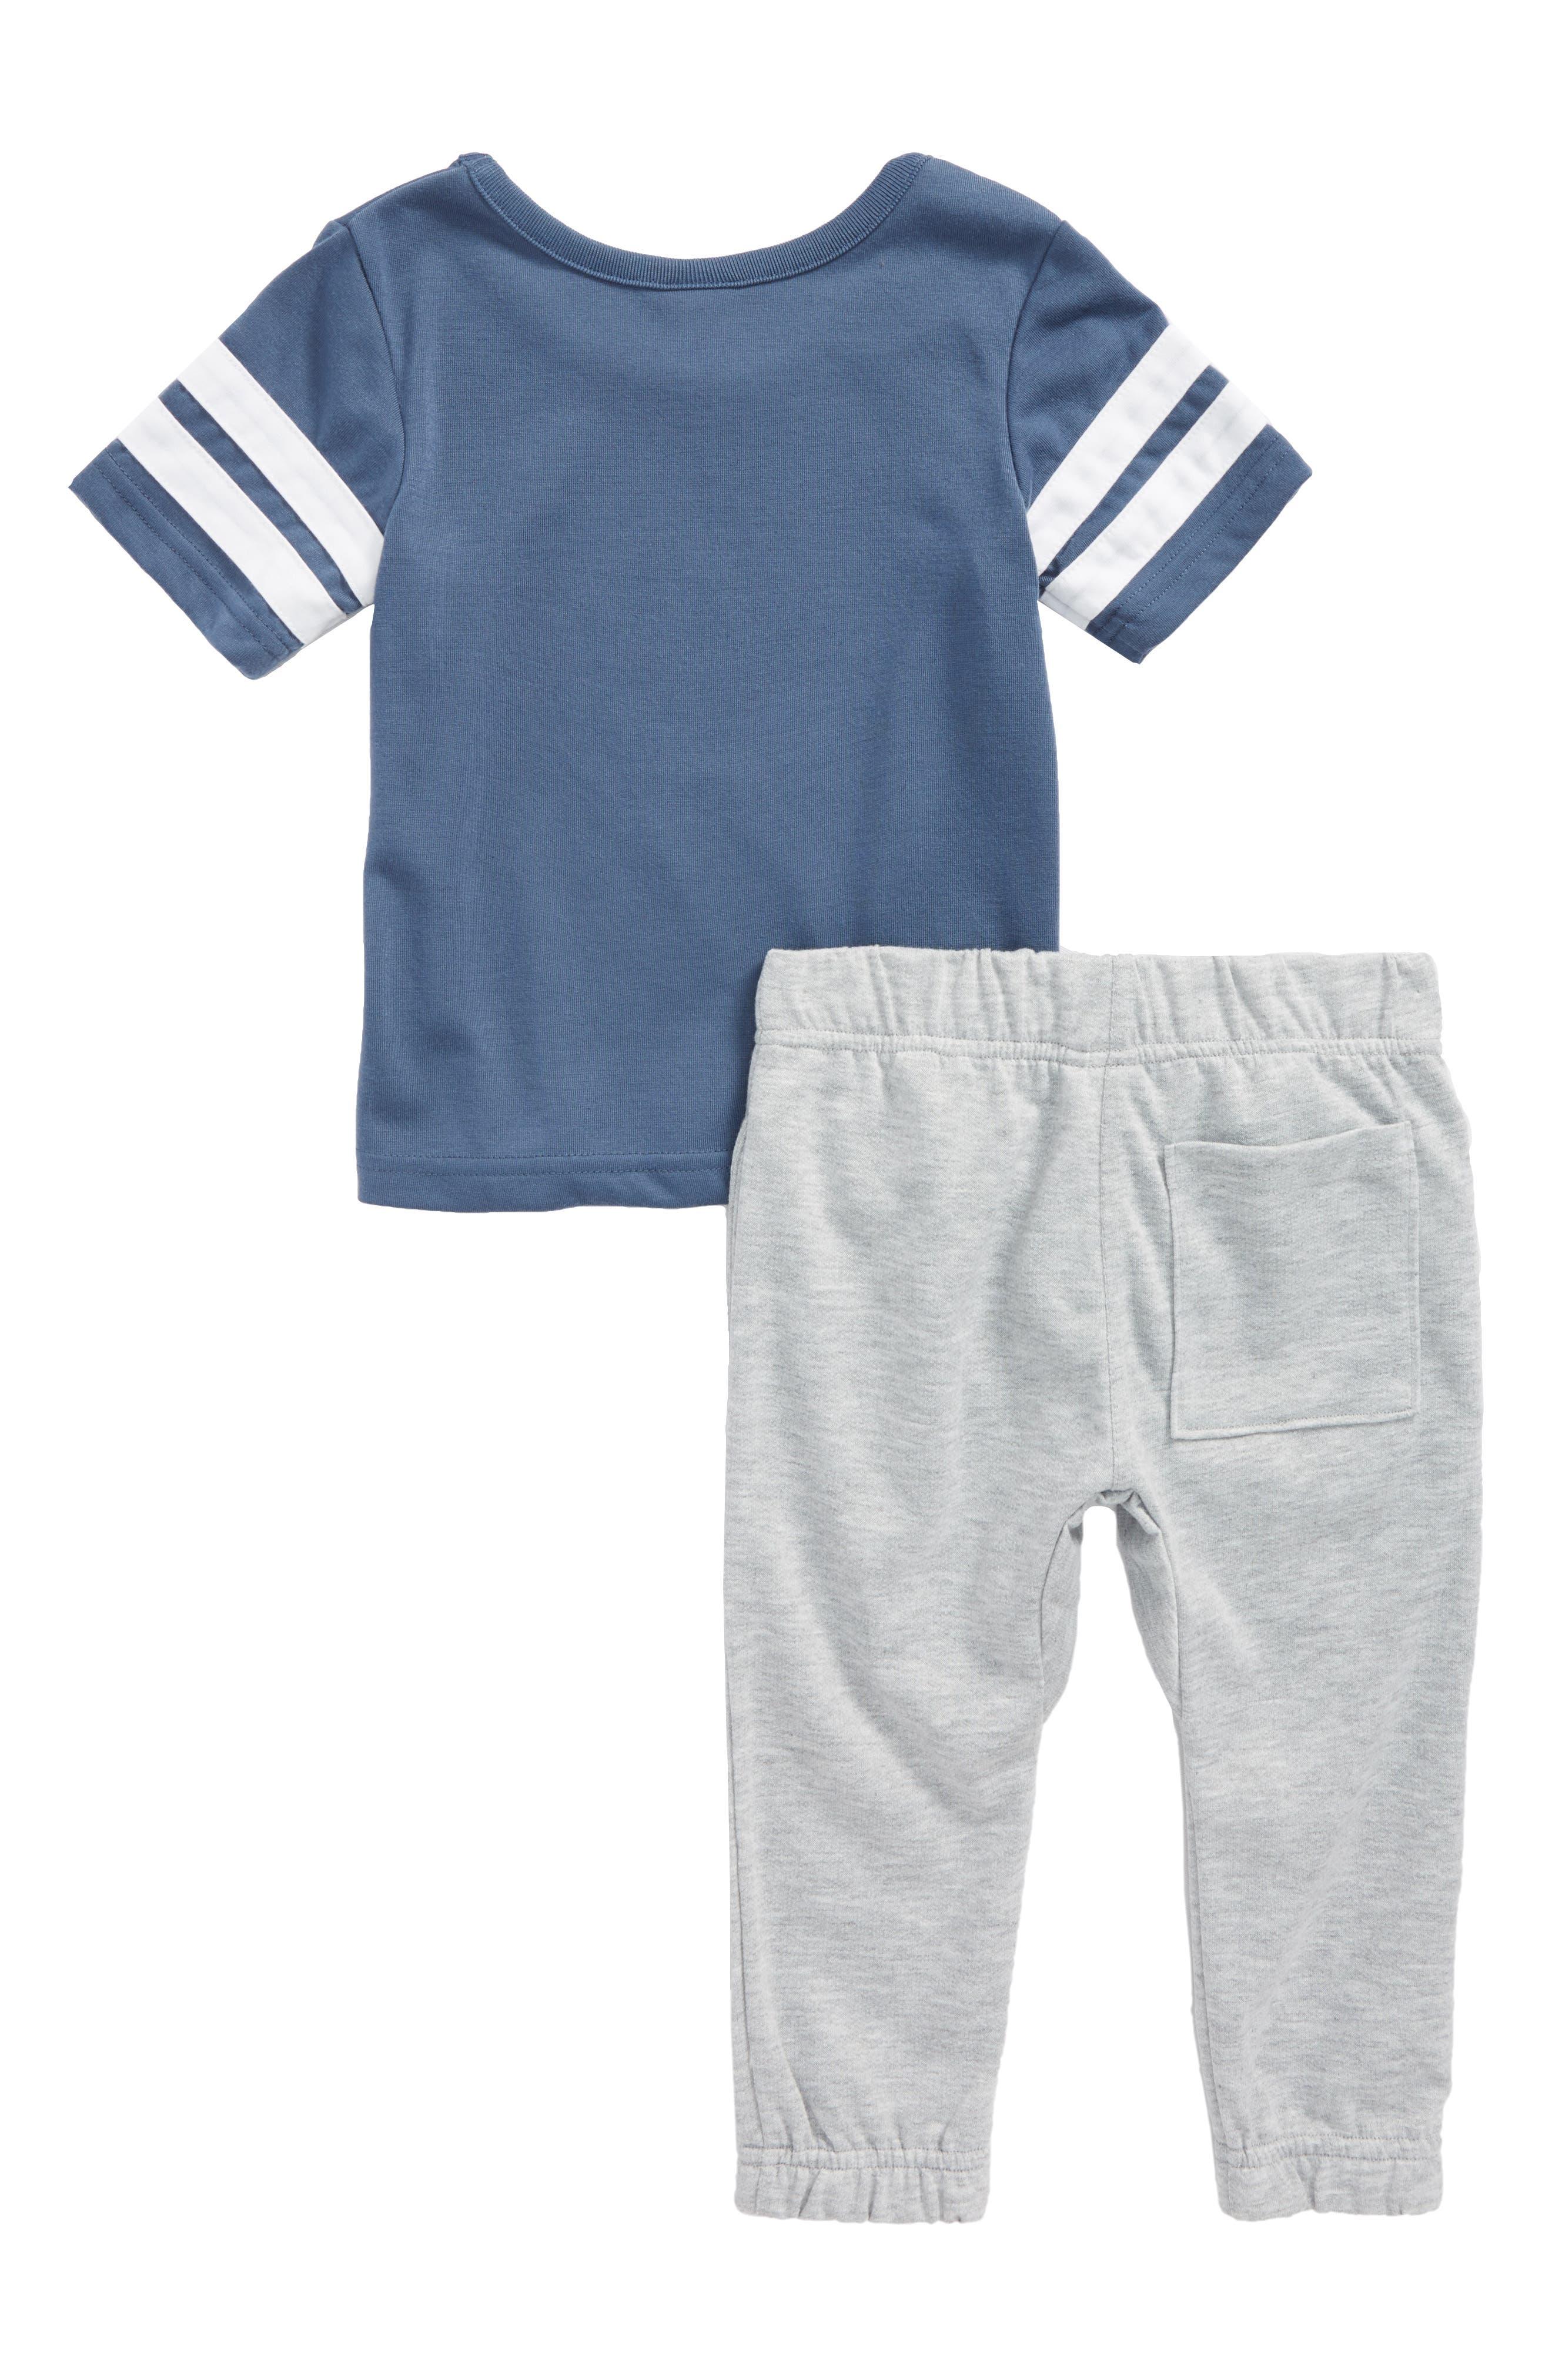 Yum Yum Two-Piece Pajamas,                             Alternate thumbnail 2, color,                             Blue Vintage Basket Swish